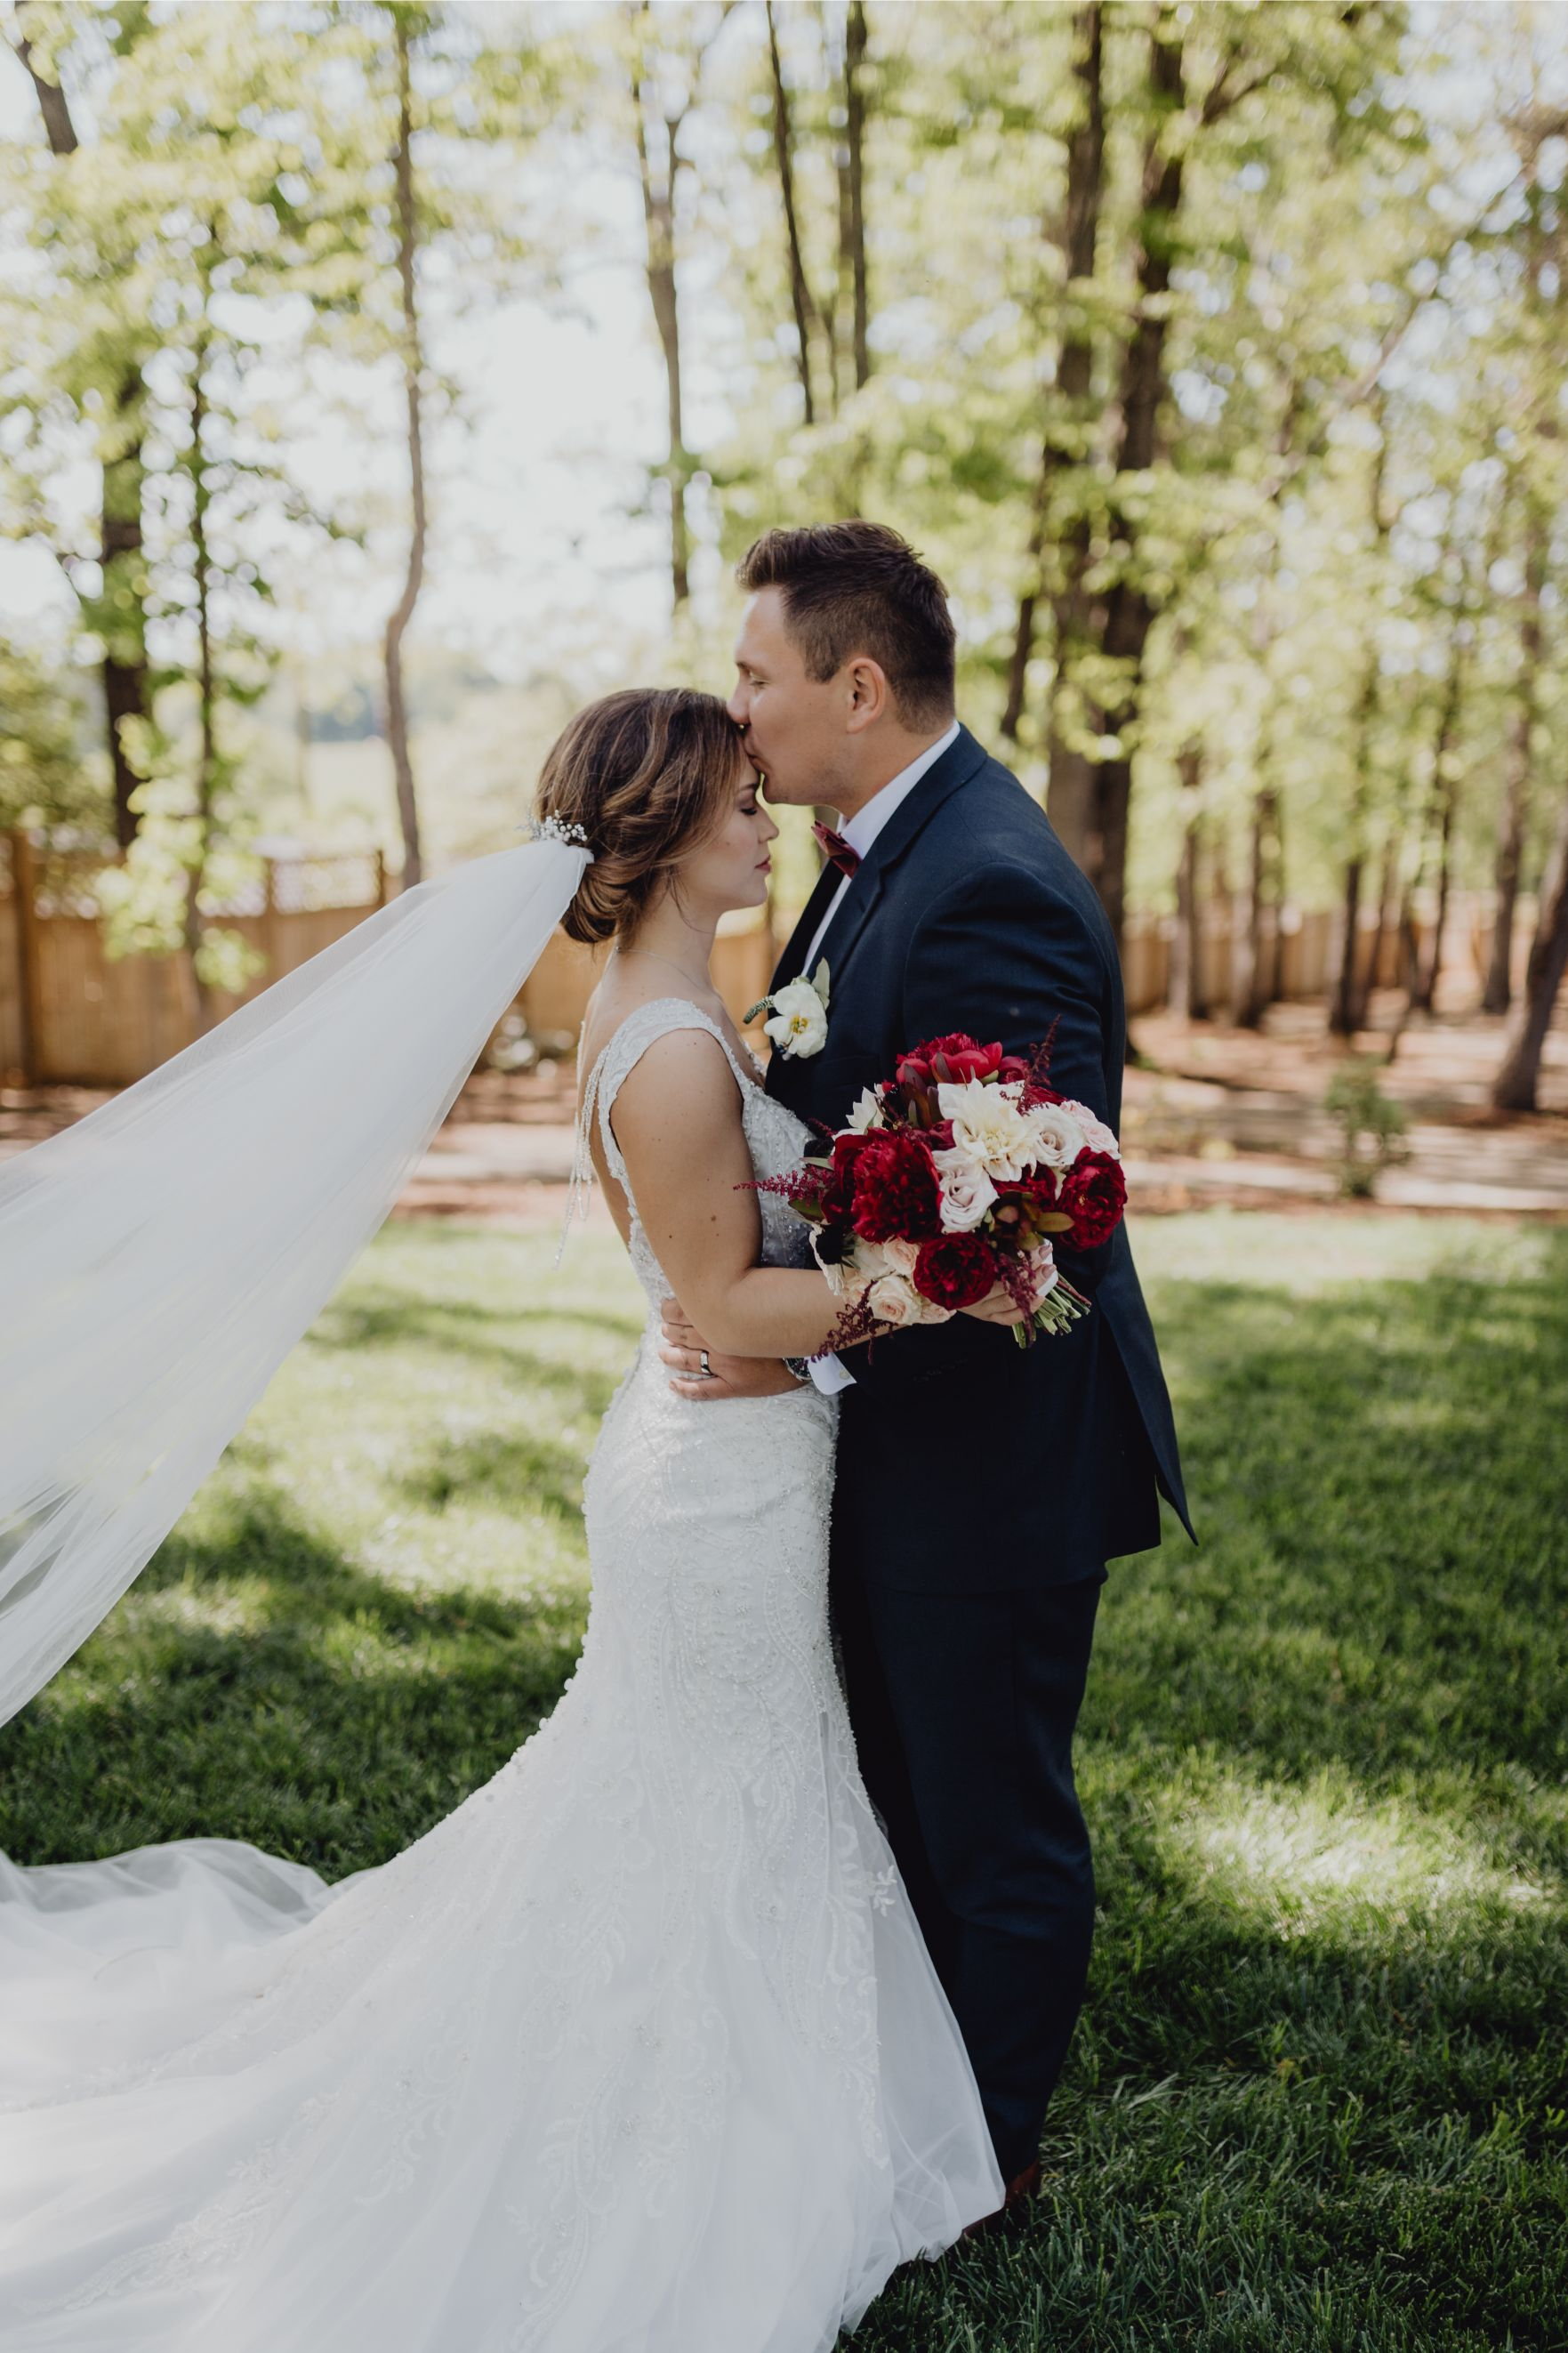 North-Dallas-Wedding-Florist-David-Co.-12.jpg